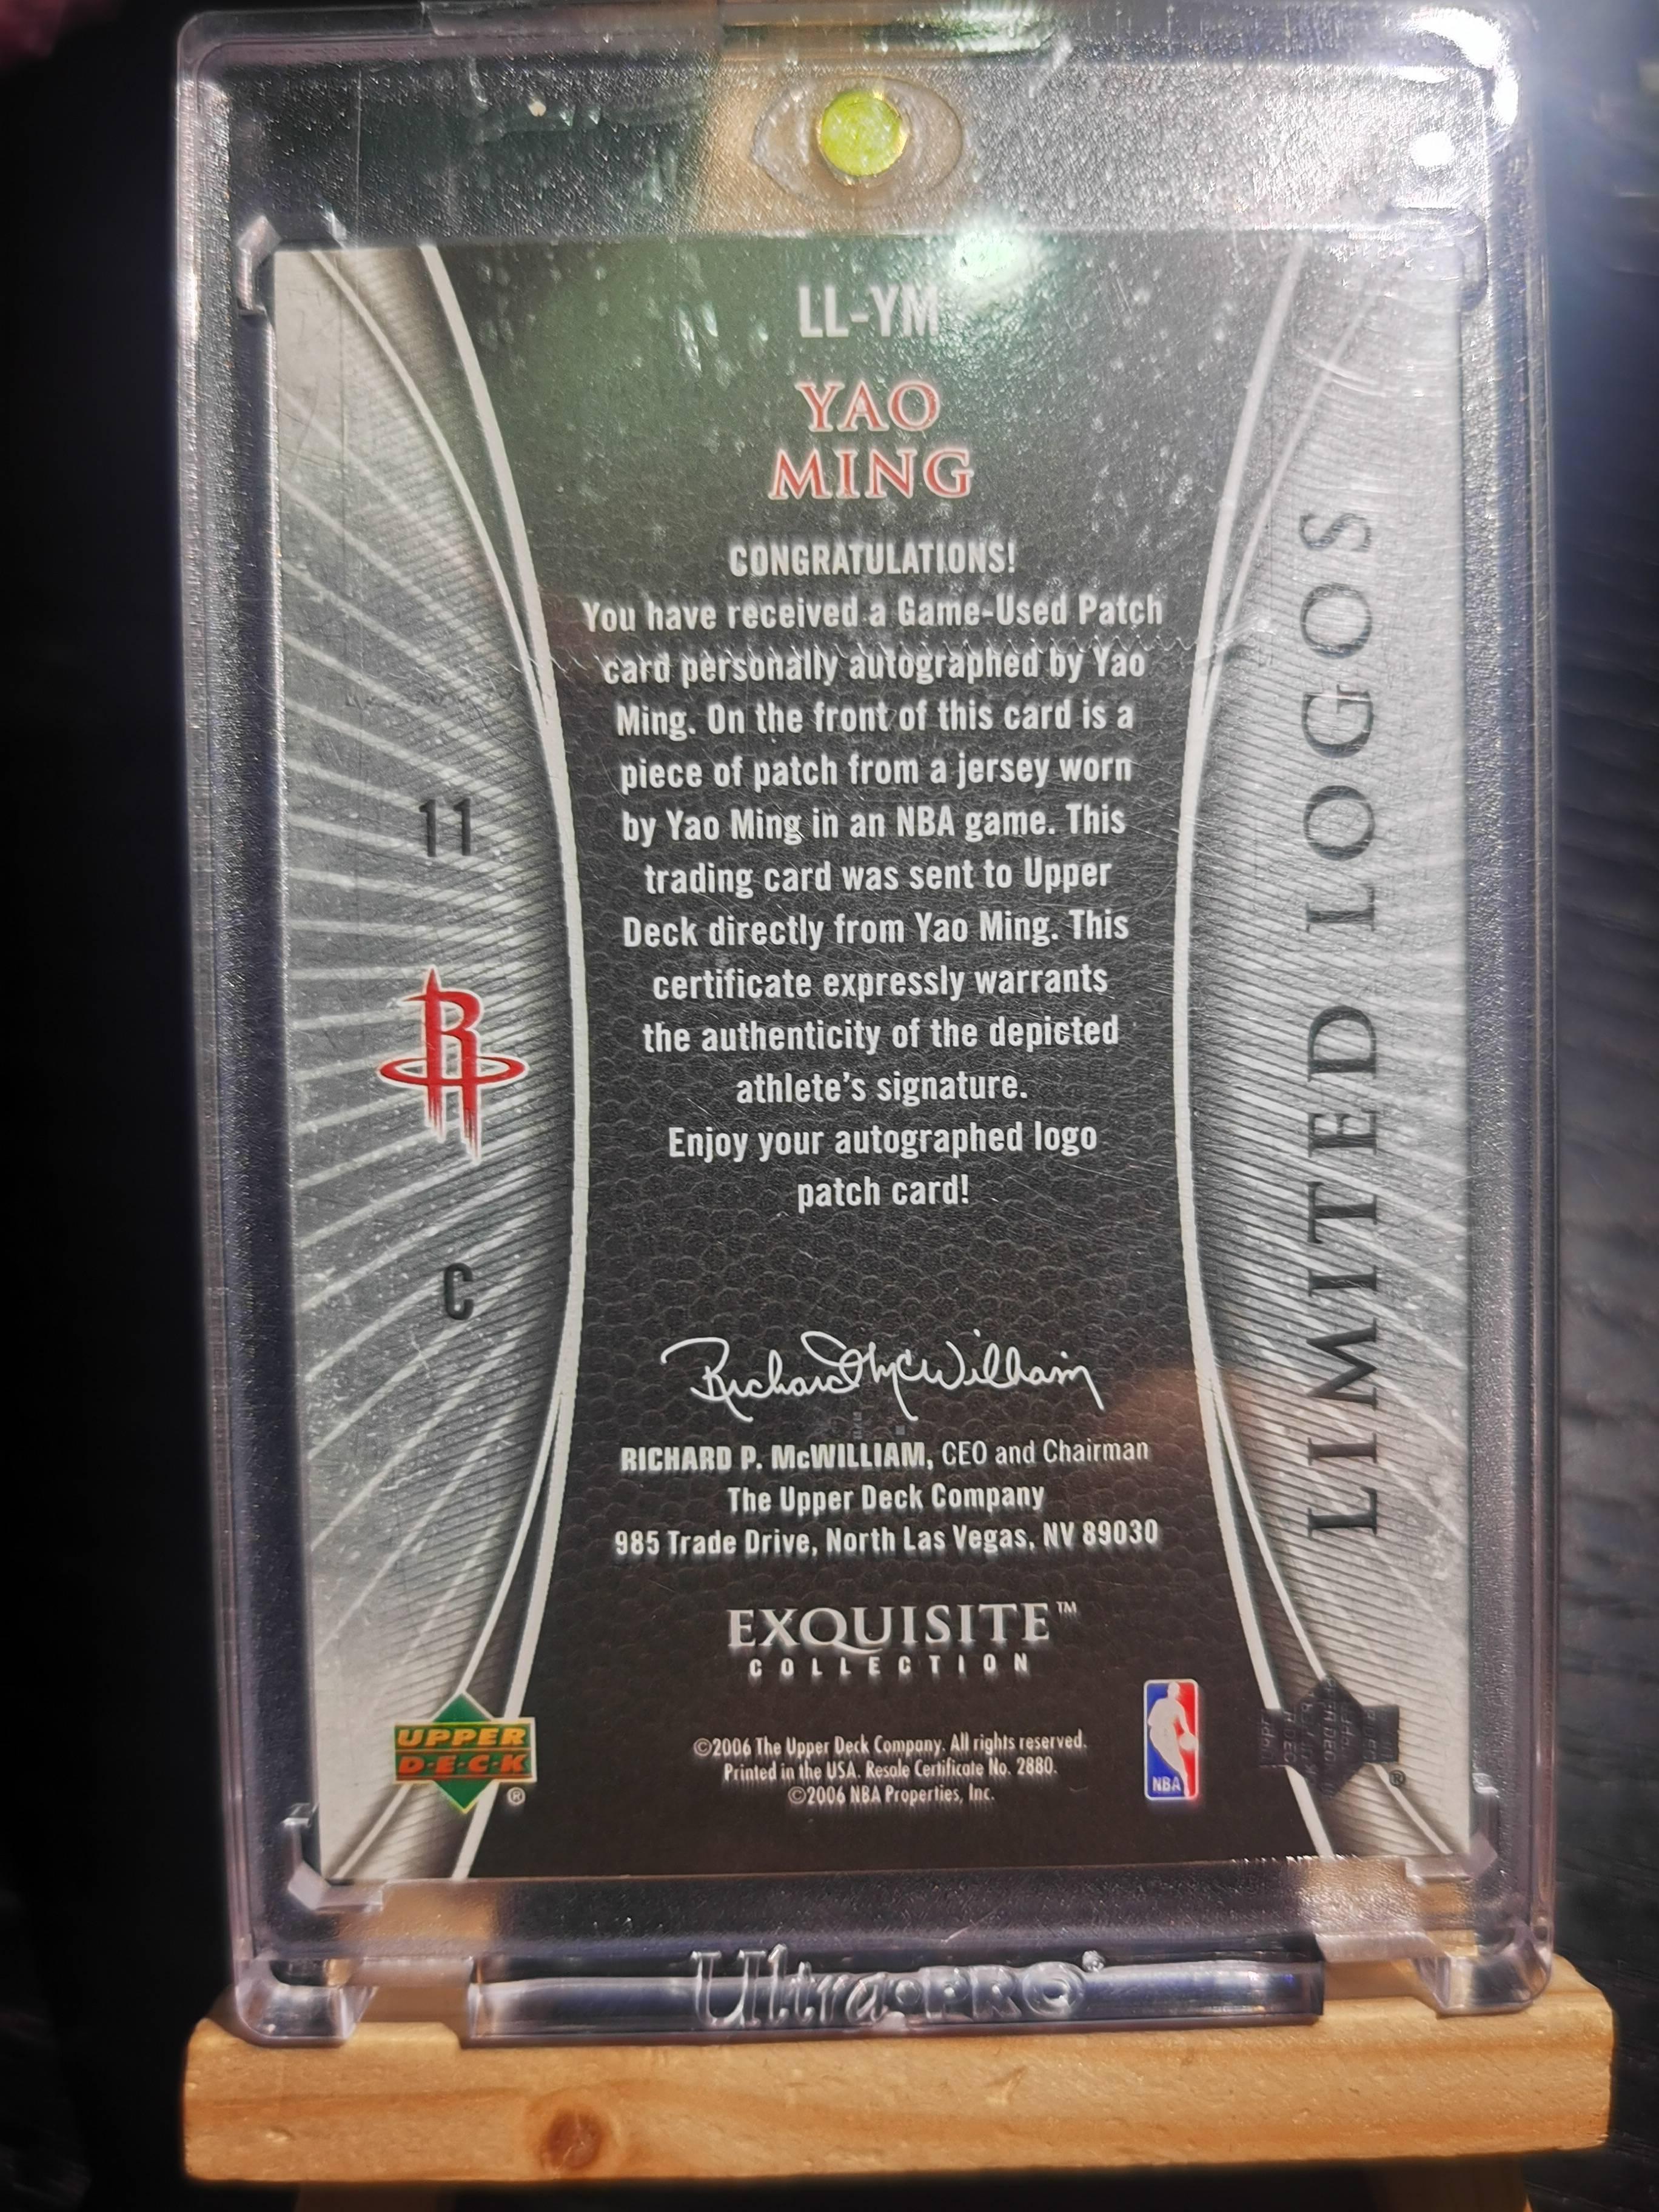 2005-06 UD EXQUISITE LL YAO 19/50,姚明,木盒LL,最高端系列最经典PA,三色暴力漂亮切割,墨迹湛蓝